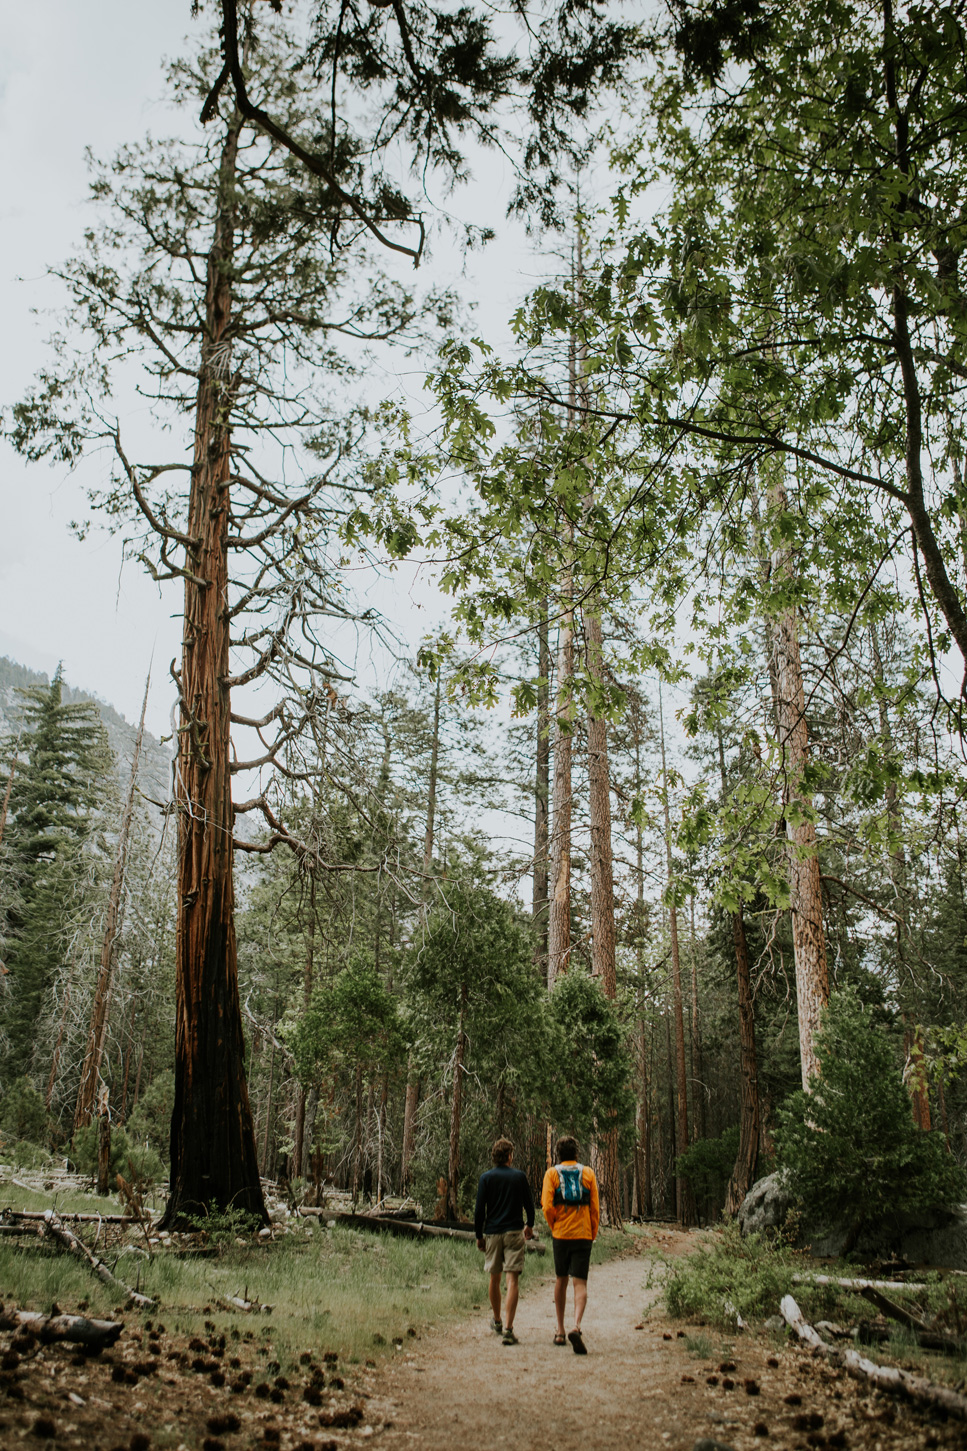 CindyGiovagnoli_Sequoia_KingsCanyon_National_Park_California_forest_fire-025.jpg